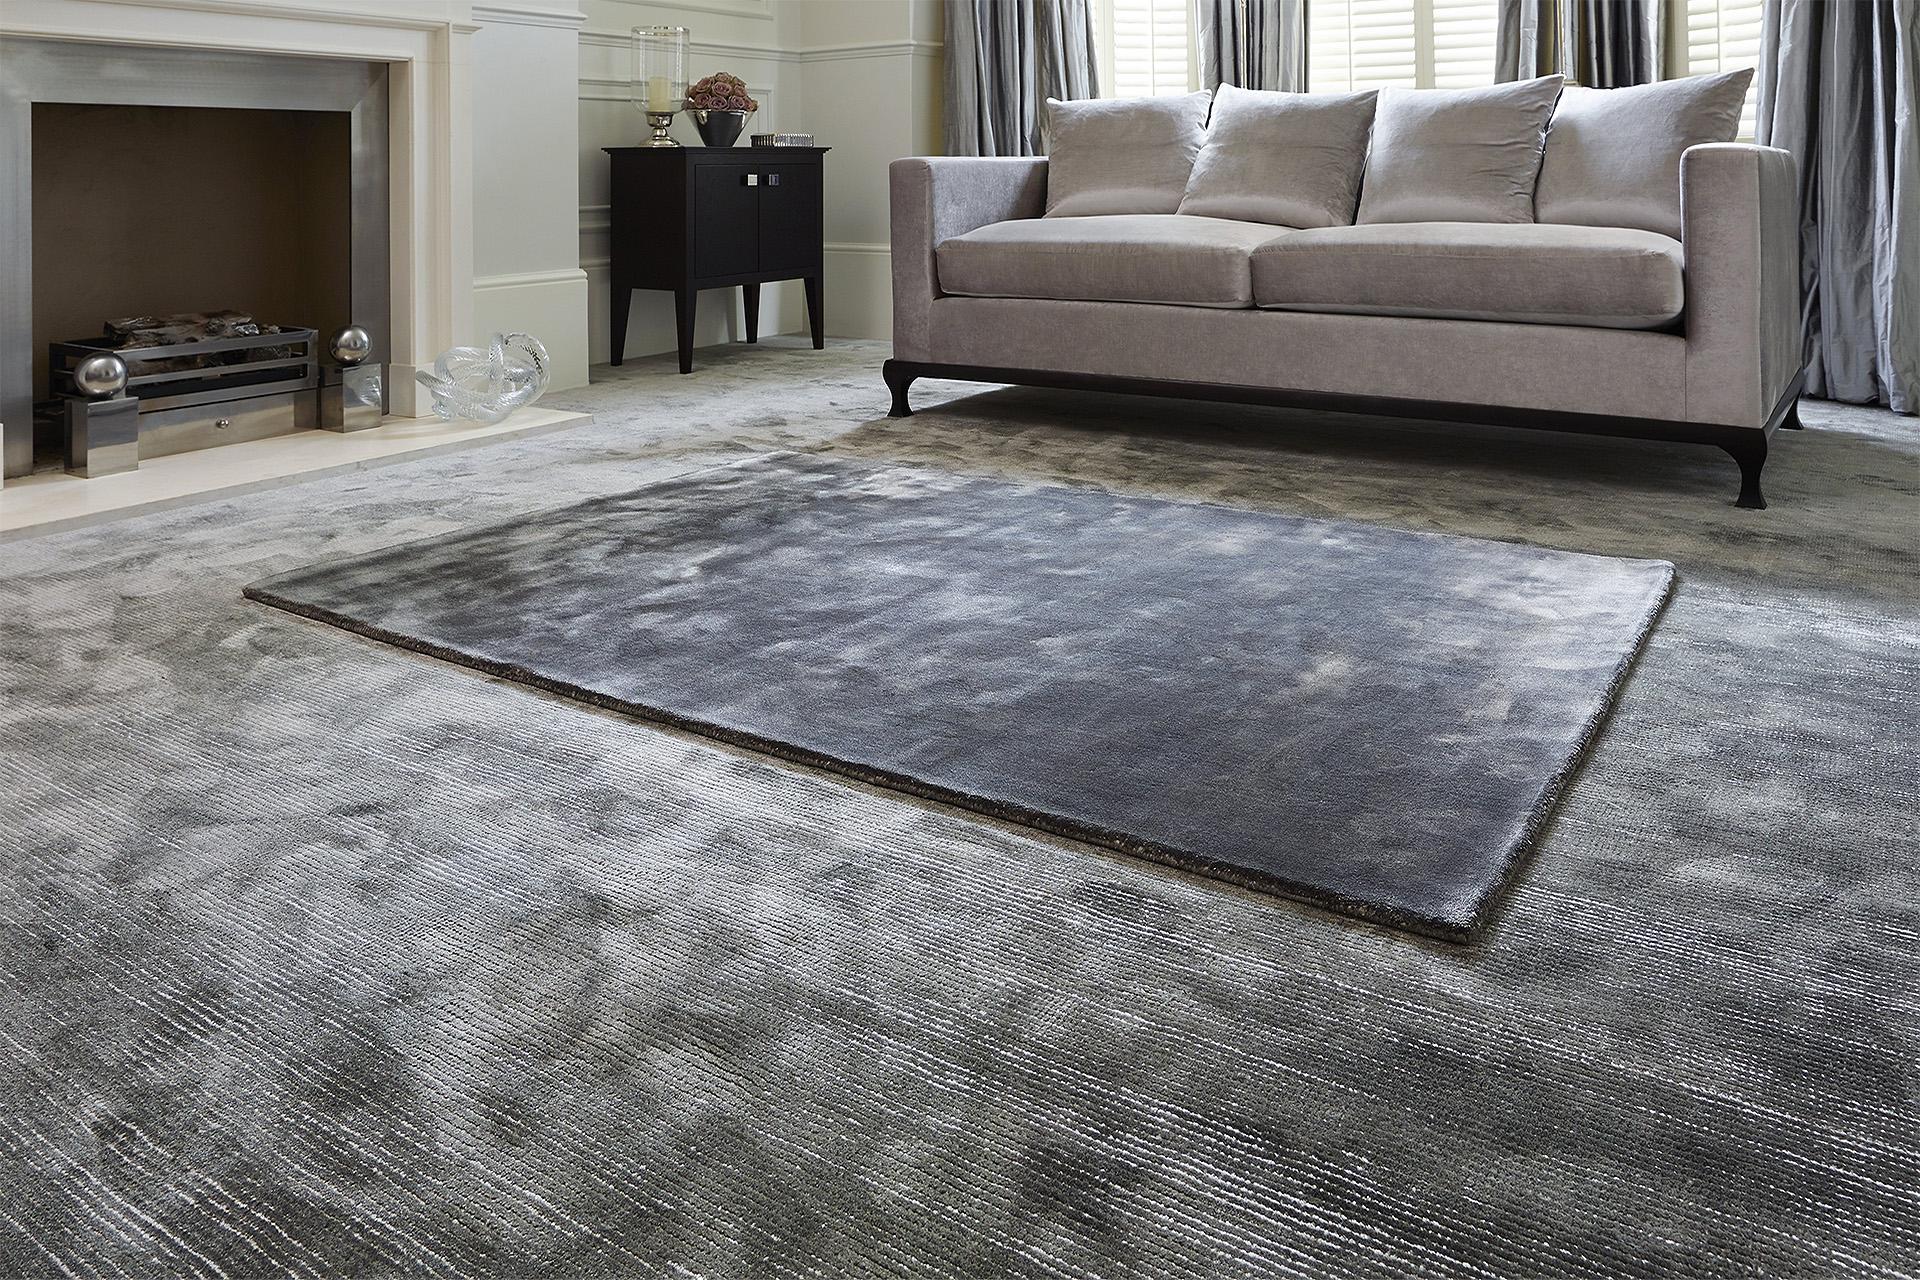 carpet fitter Oxford